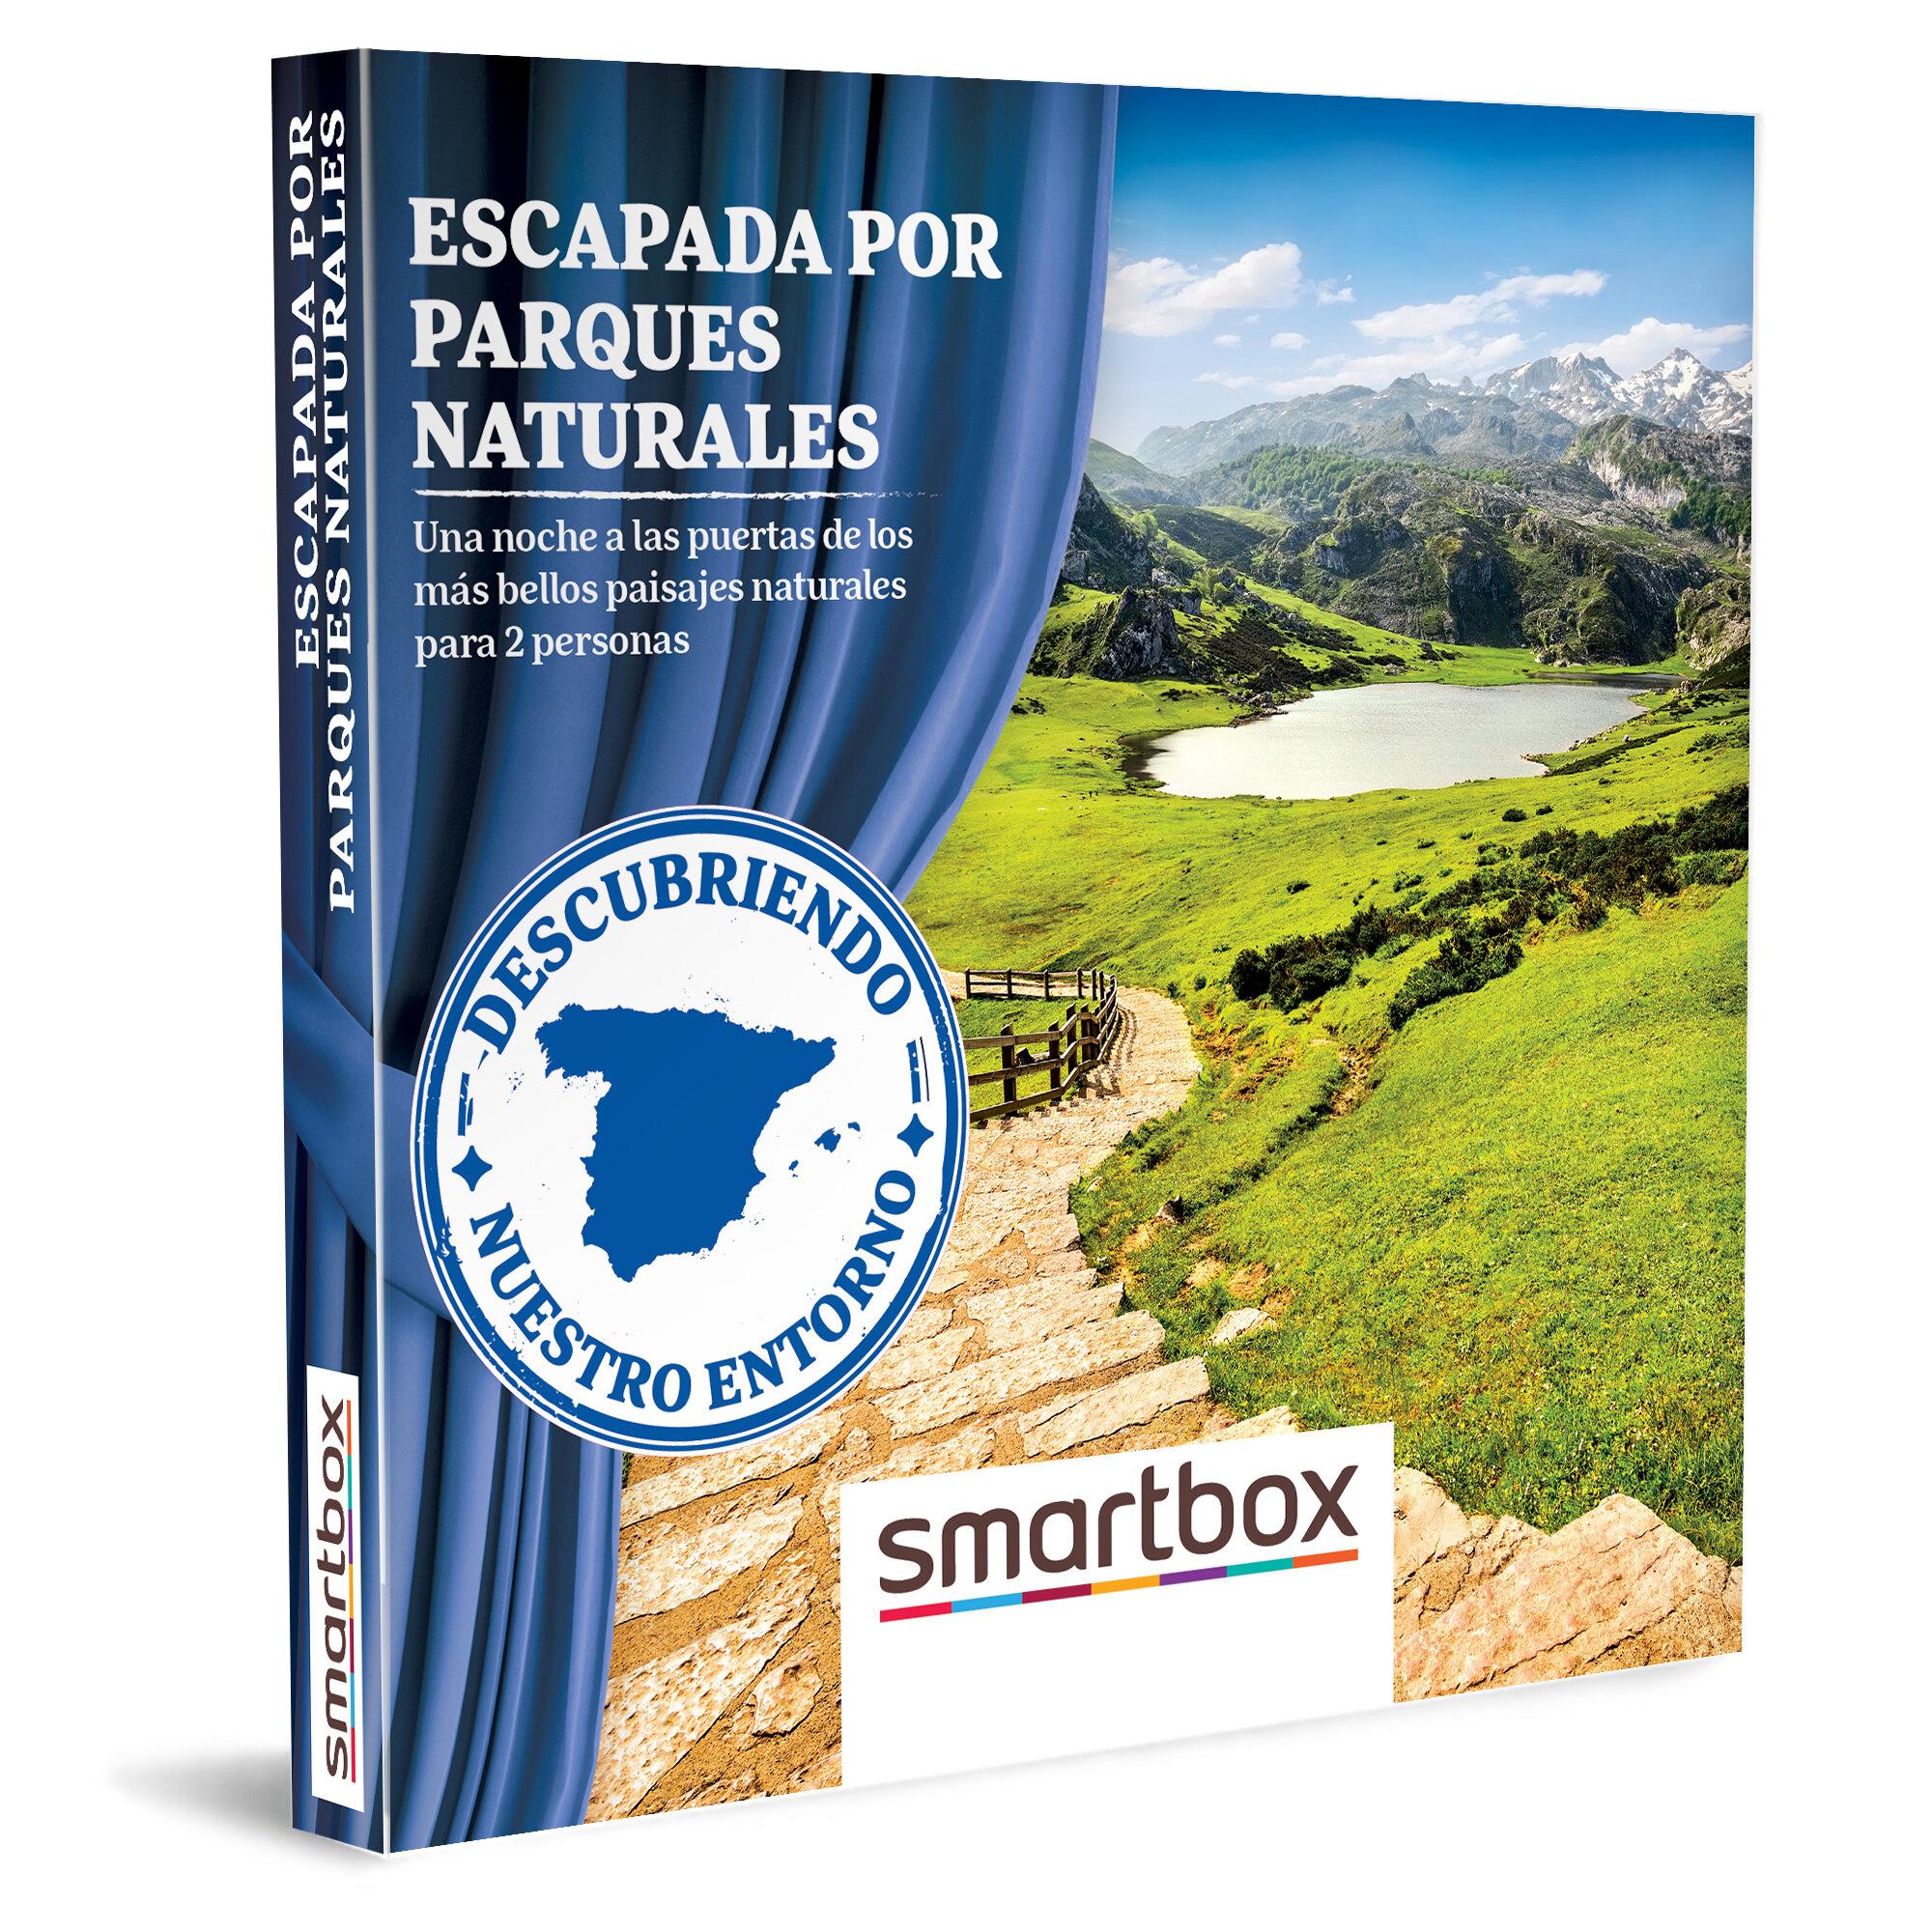 Smartbox |Escapada por parques naturales